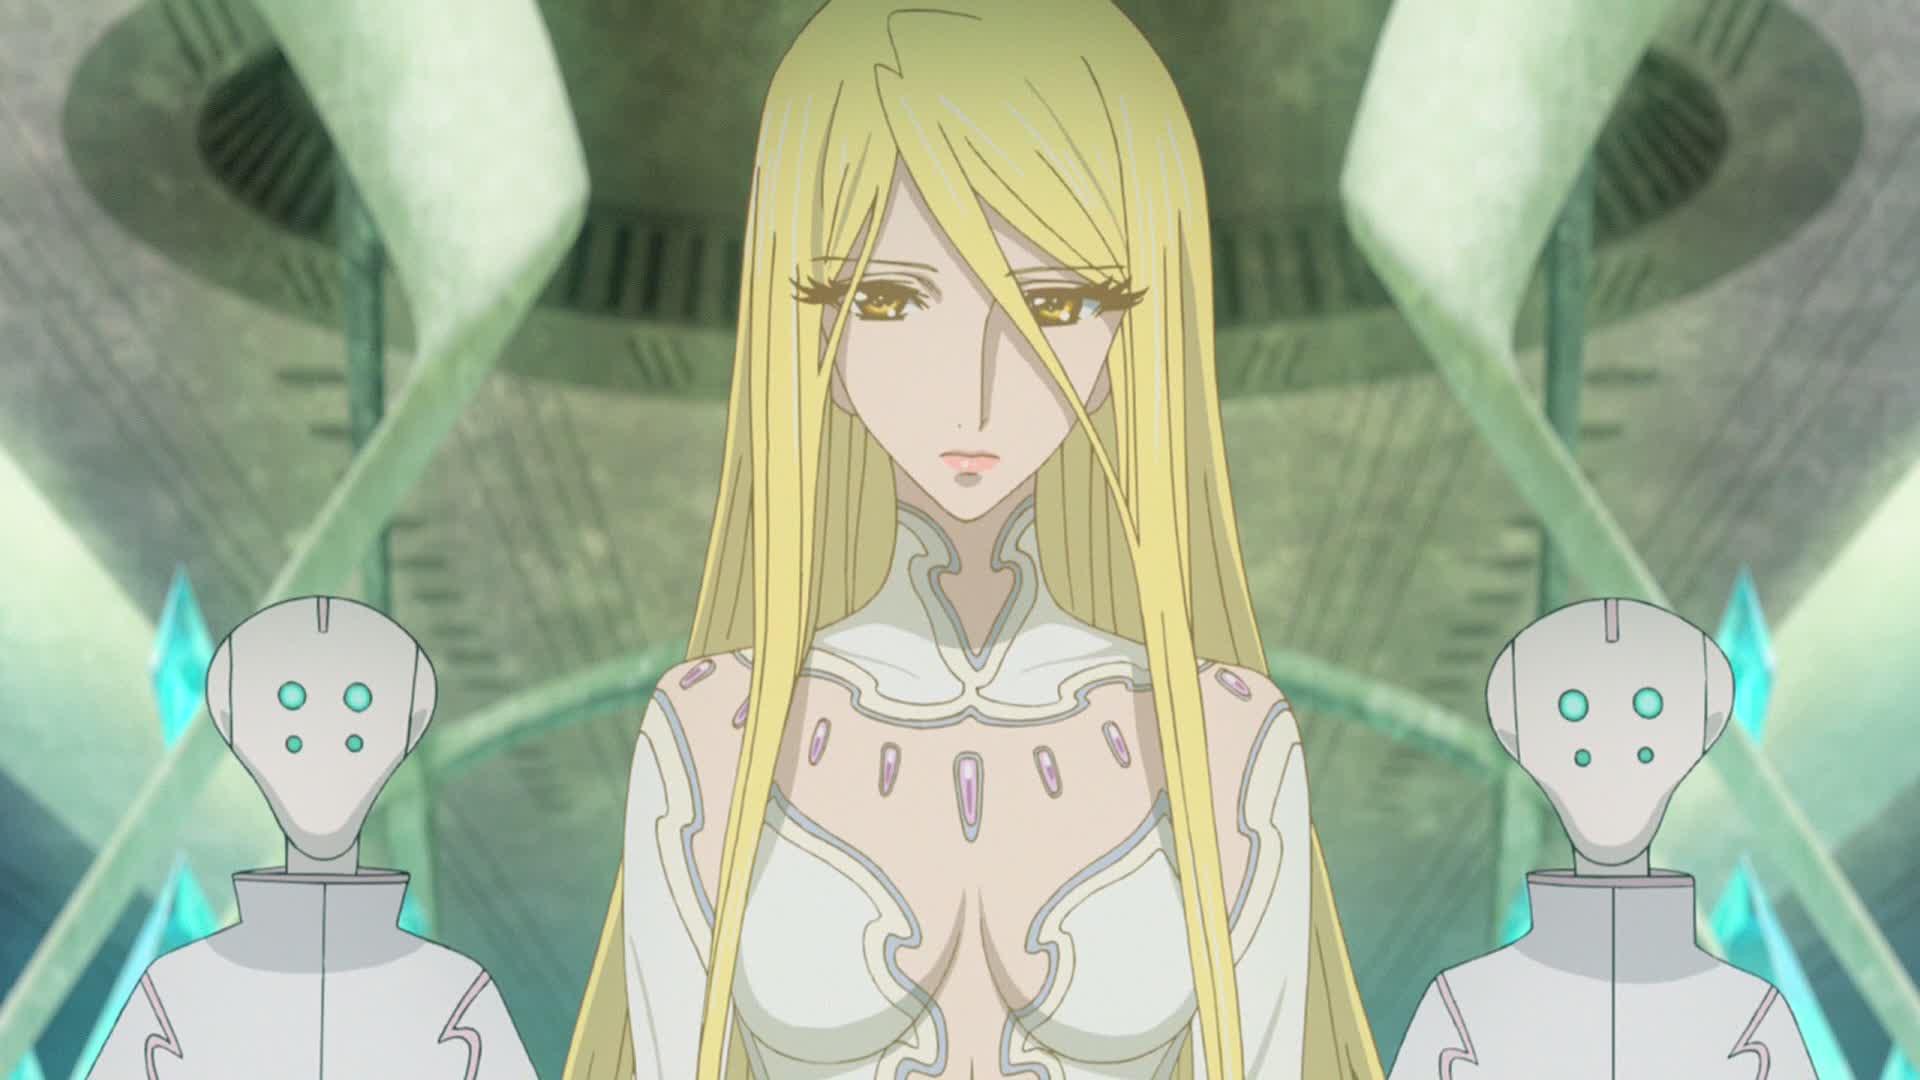 Wallpaper Space Battleship Yamato 2199 Iscandar Starsha Anime